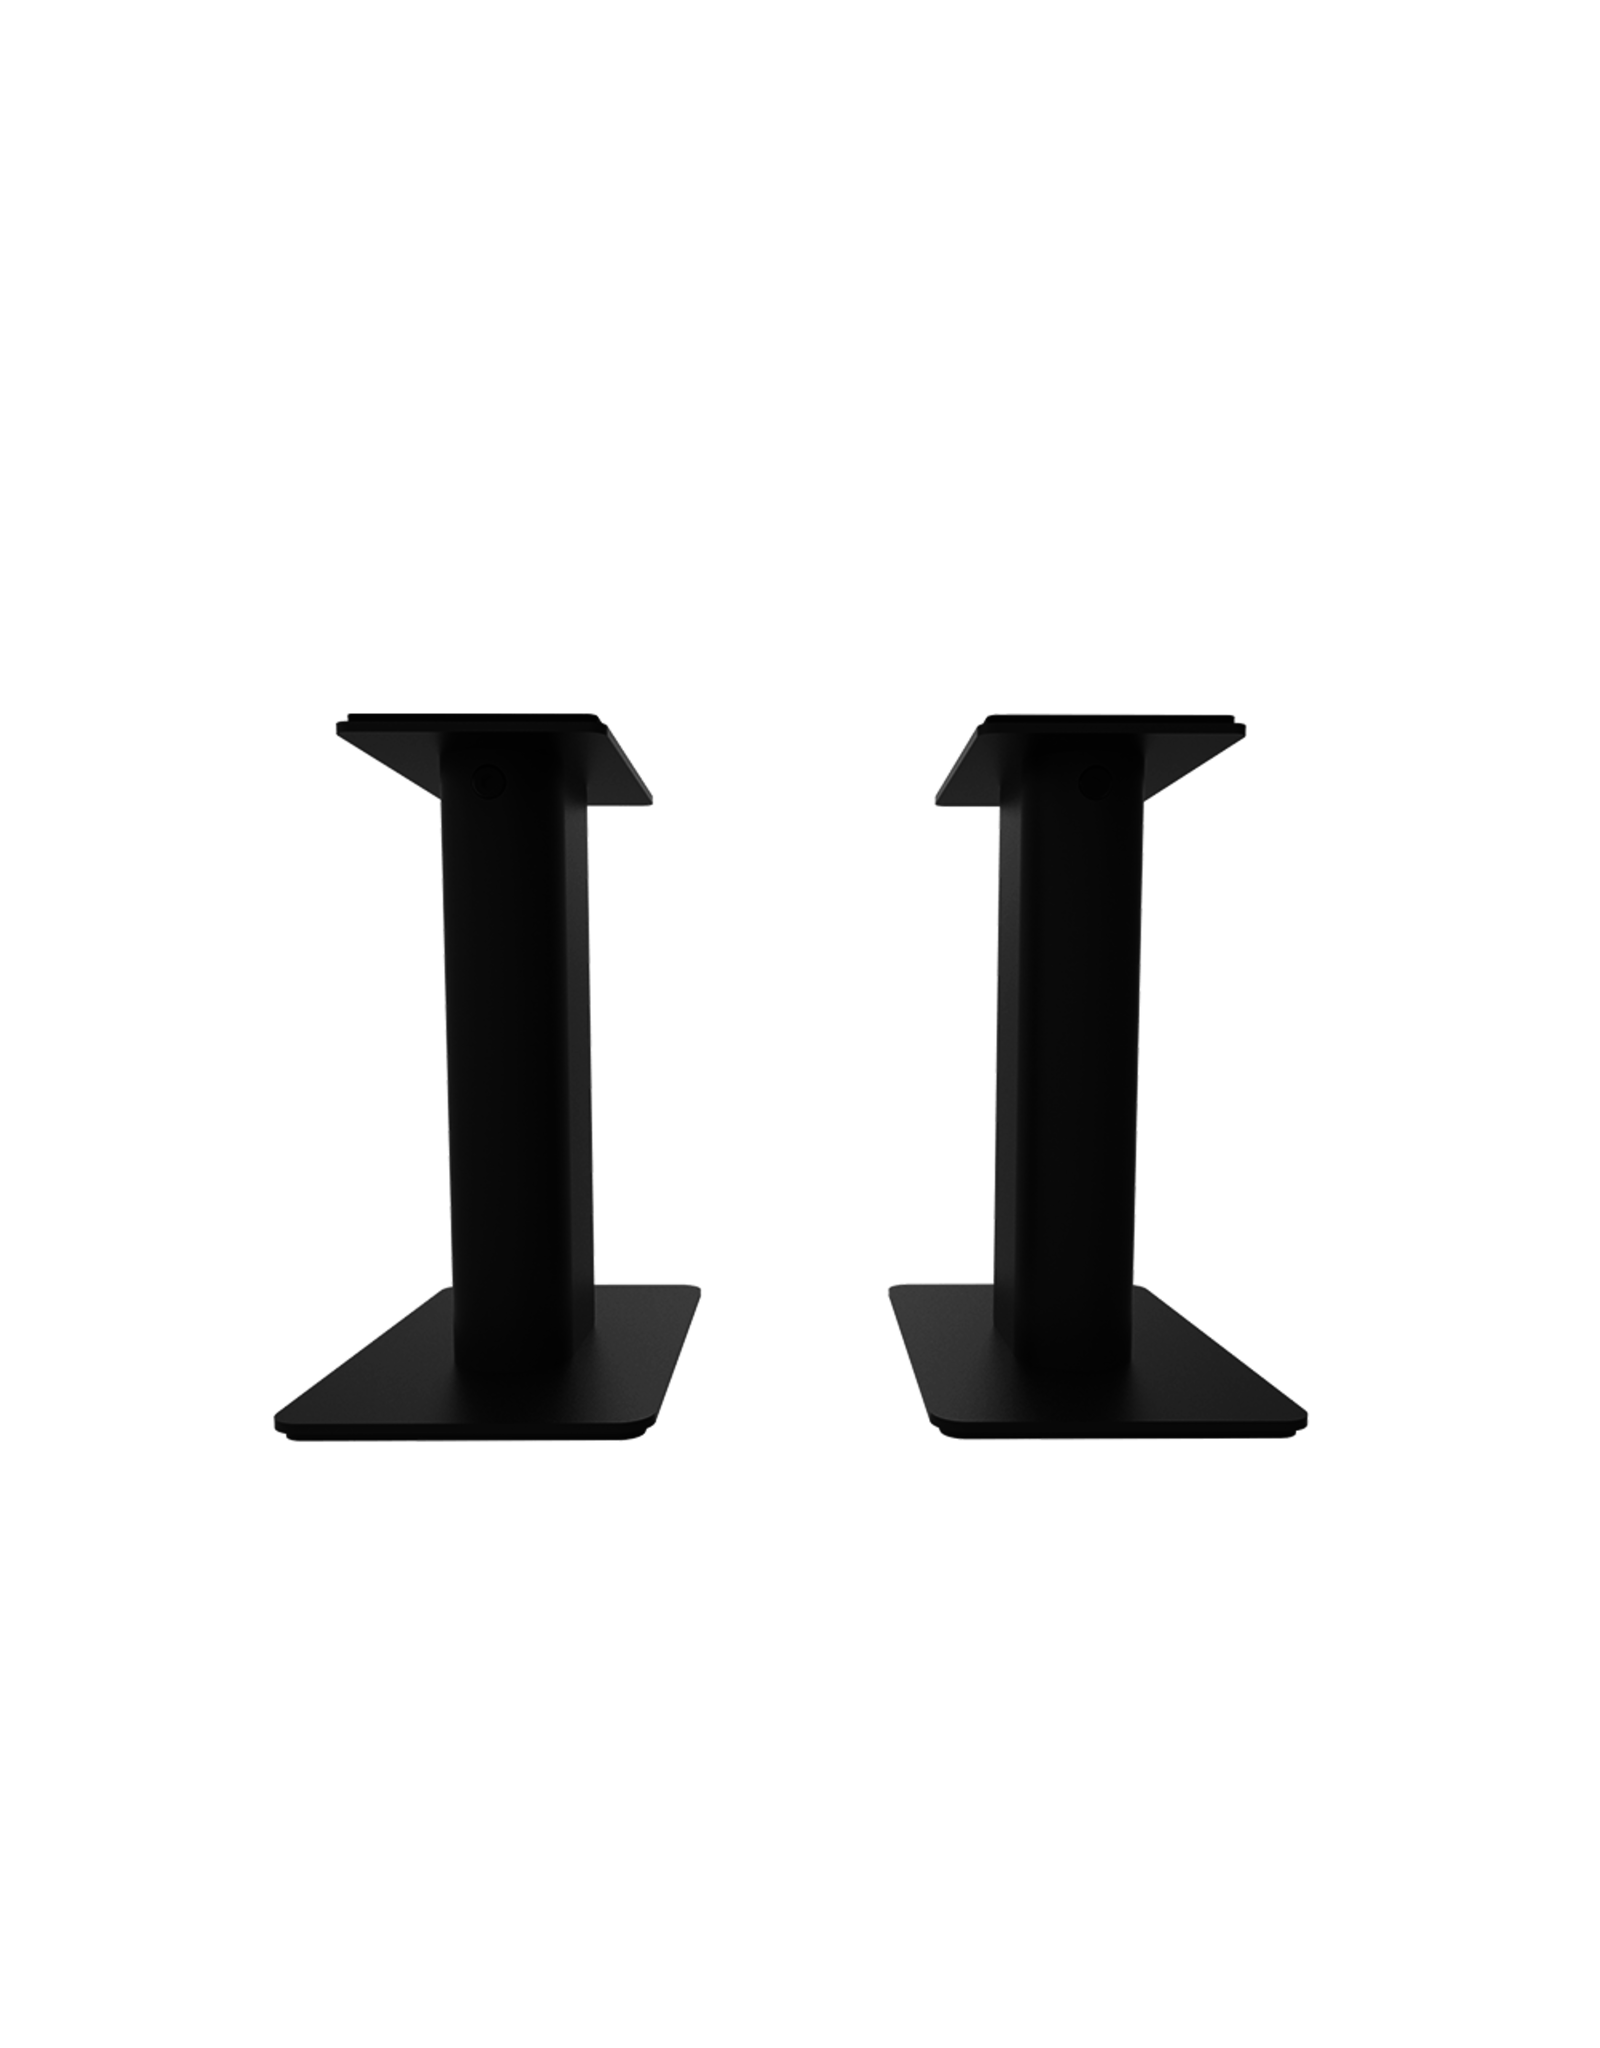 Kanto Kanto SP9 9 Inch Universal Desktop Speaker Stands